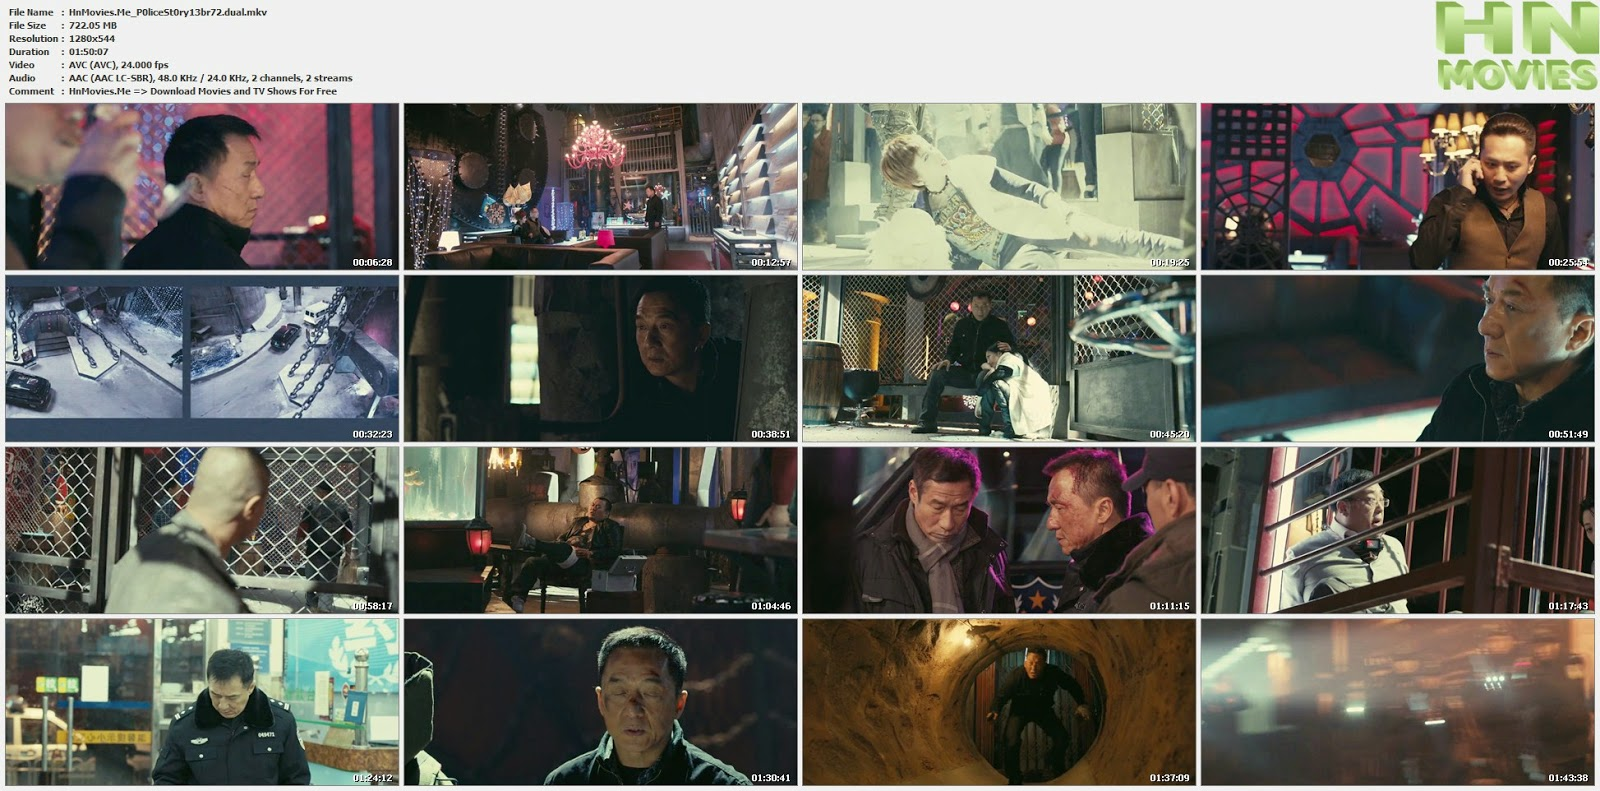 movie screenshot of Police Story 2013 fdmovie.com